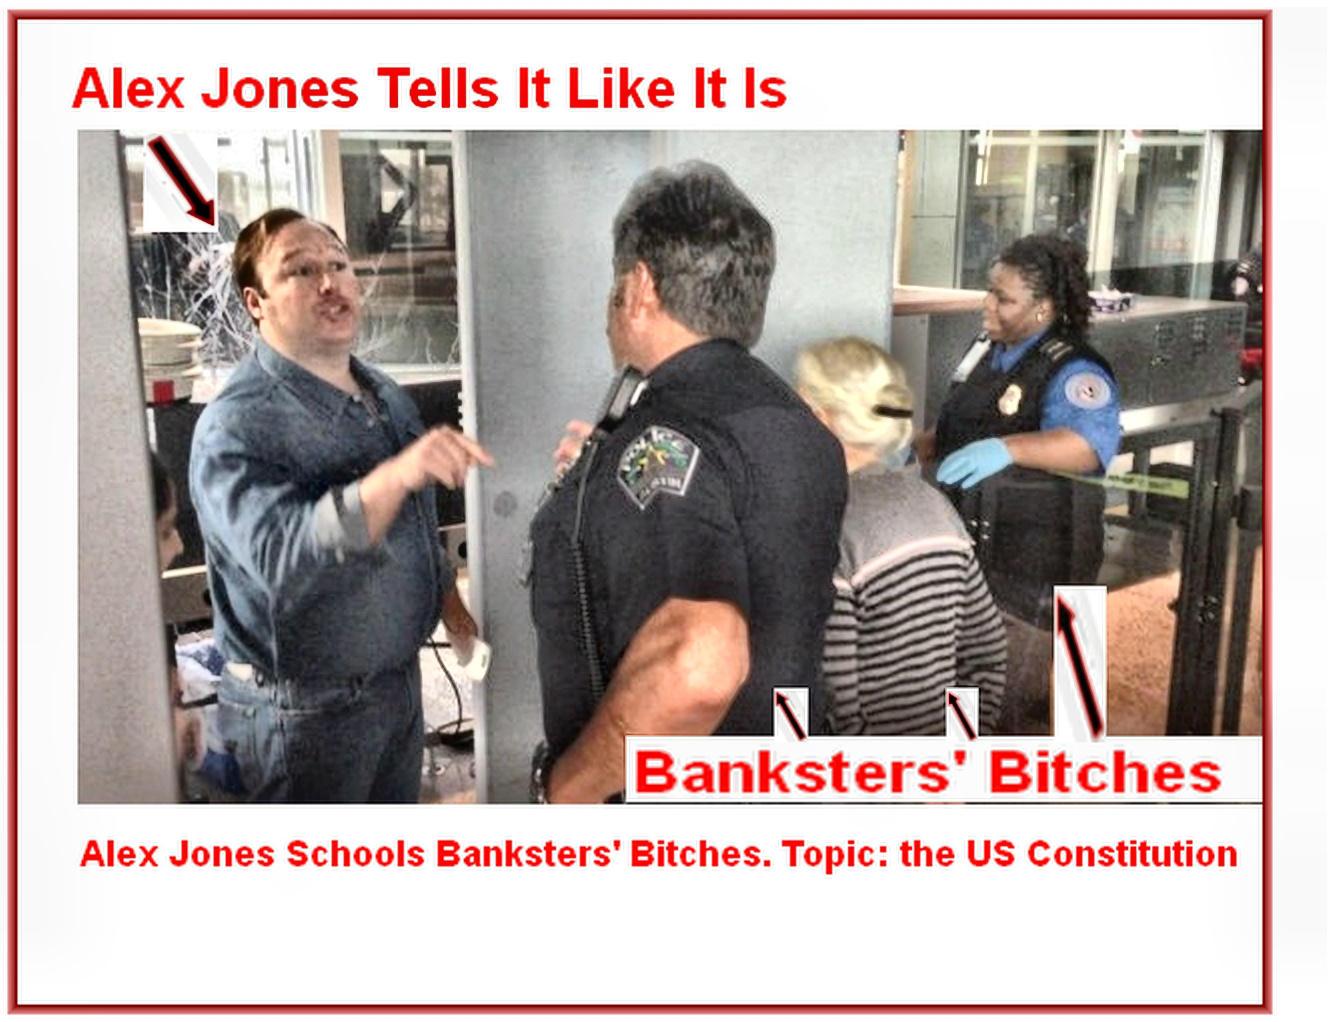 Alex Jones Schools Banksters' Bitches